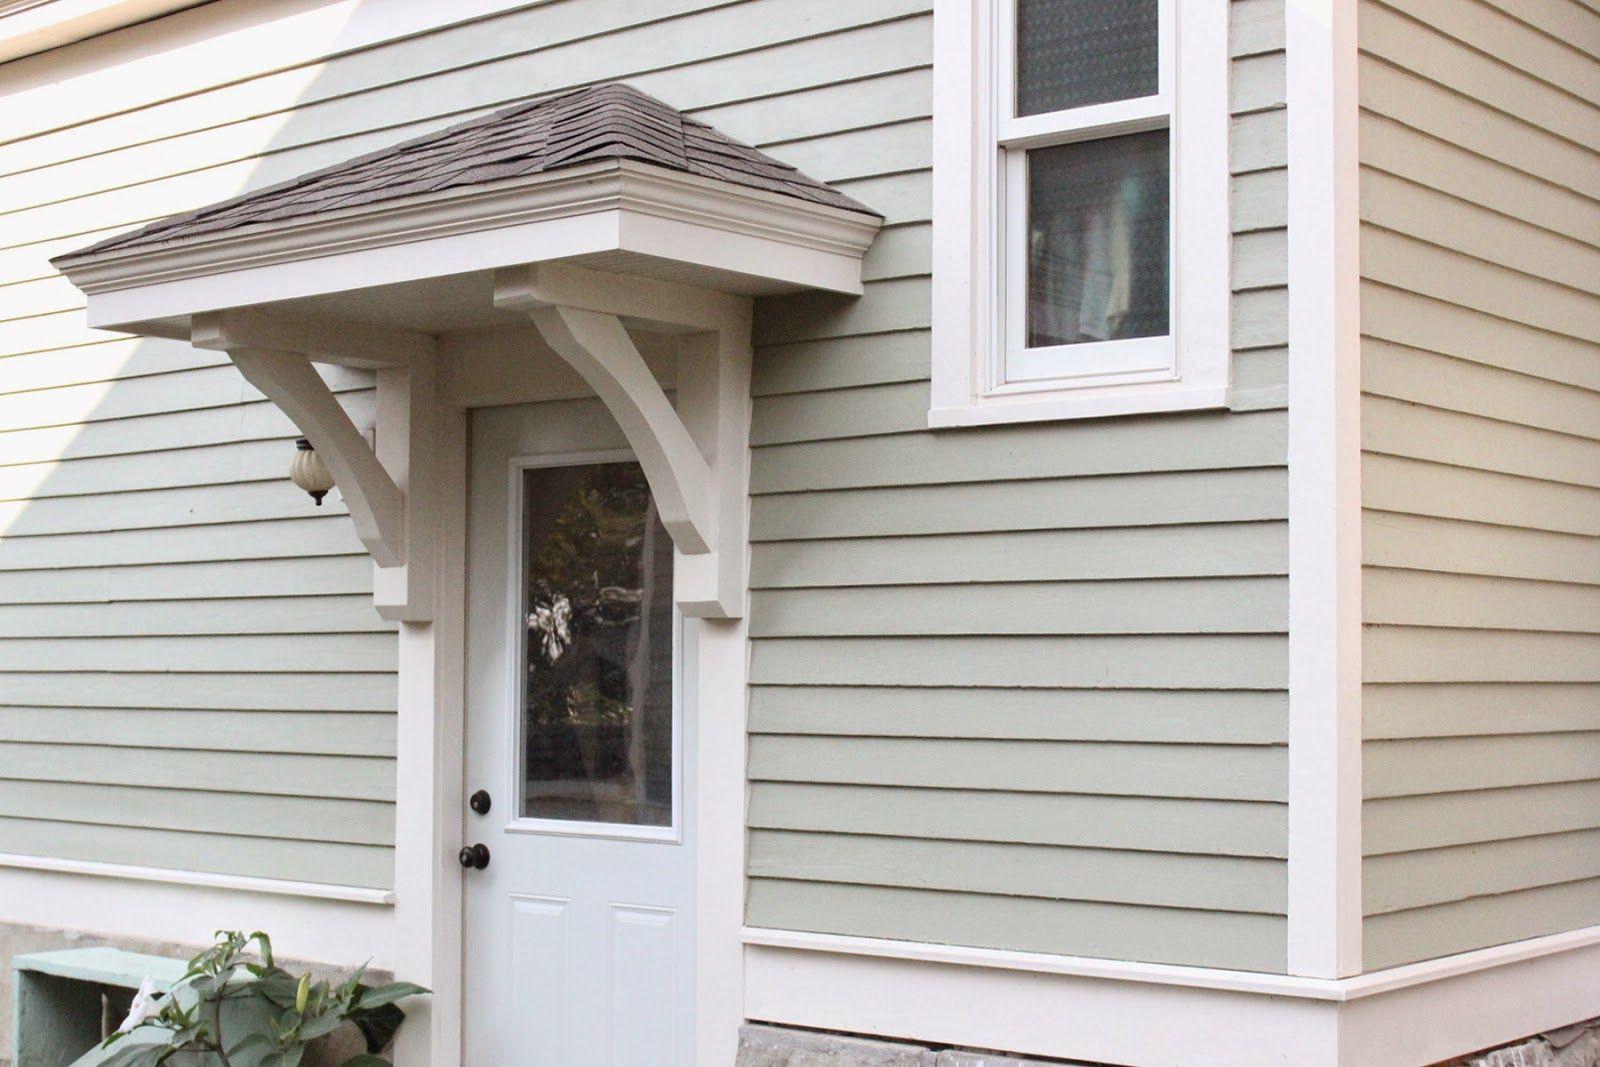 Captivating Bricks U0026 Honey: Building The Side Door Overhang    Need To Do This